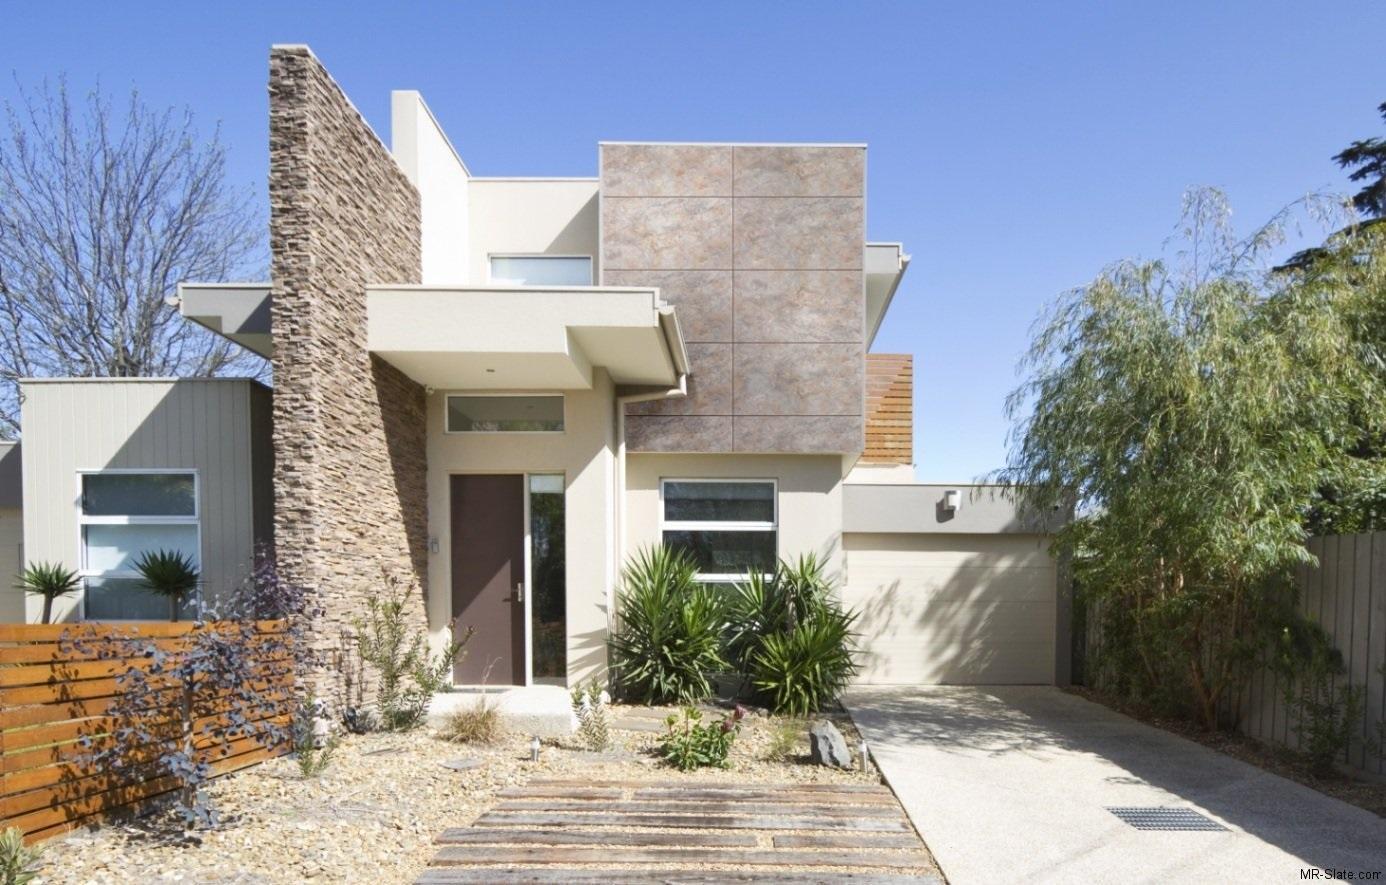 60 modelos de muros residenciais fachadas fotos e dicas for Piani di casa contemporanea moderna